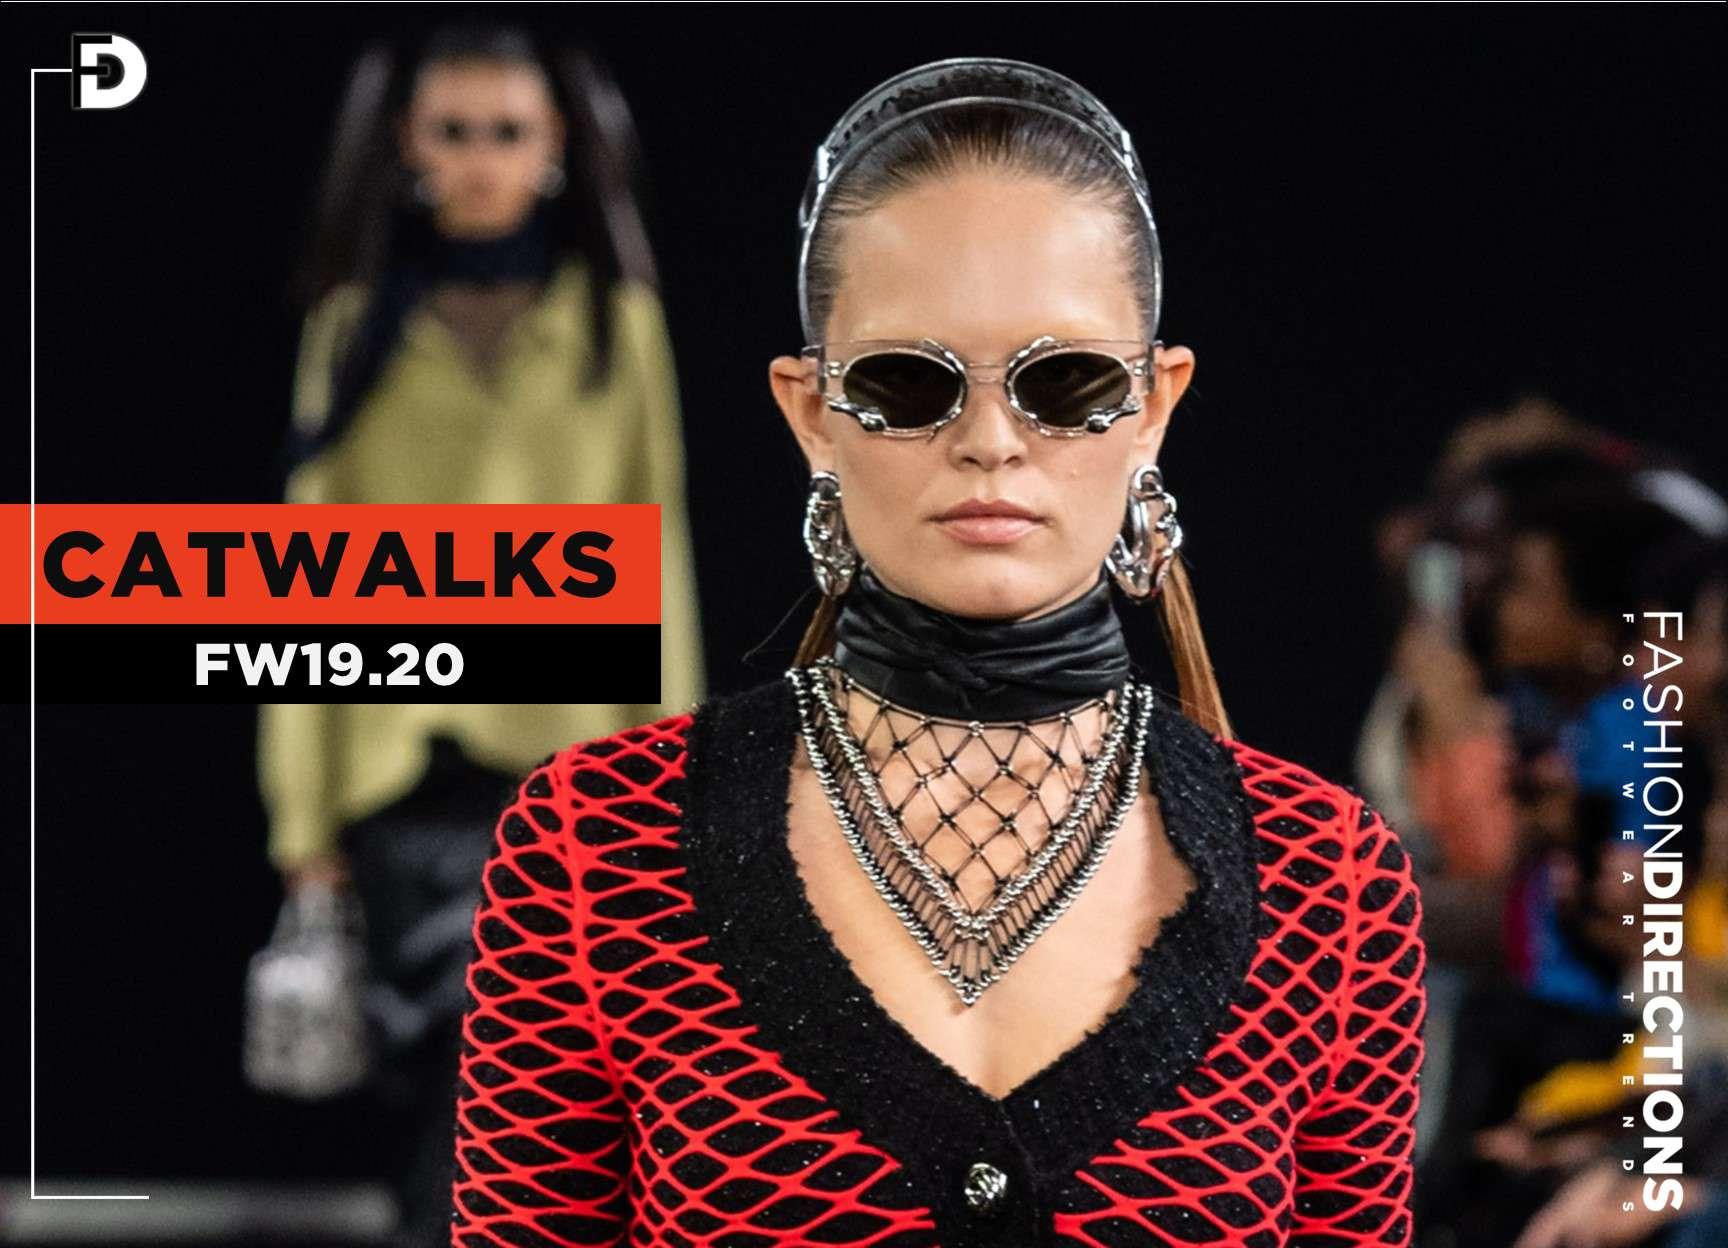 Catwalks FW19.20